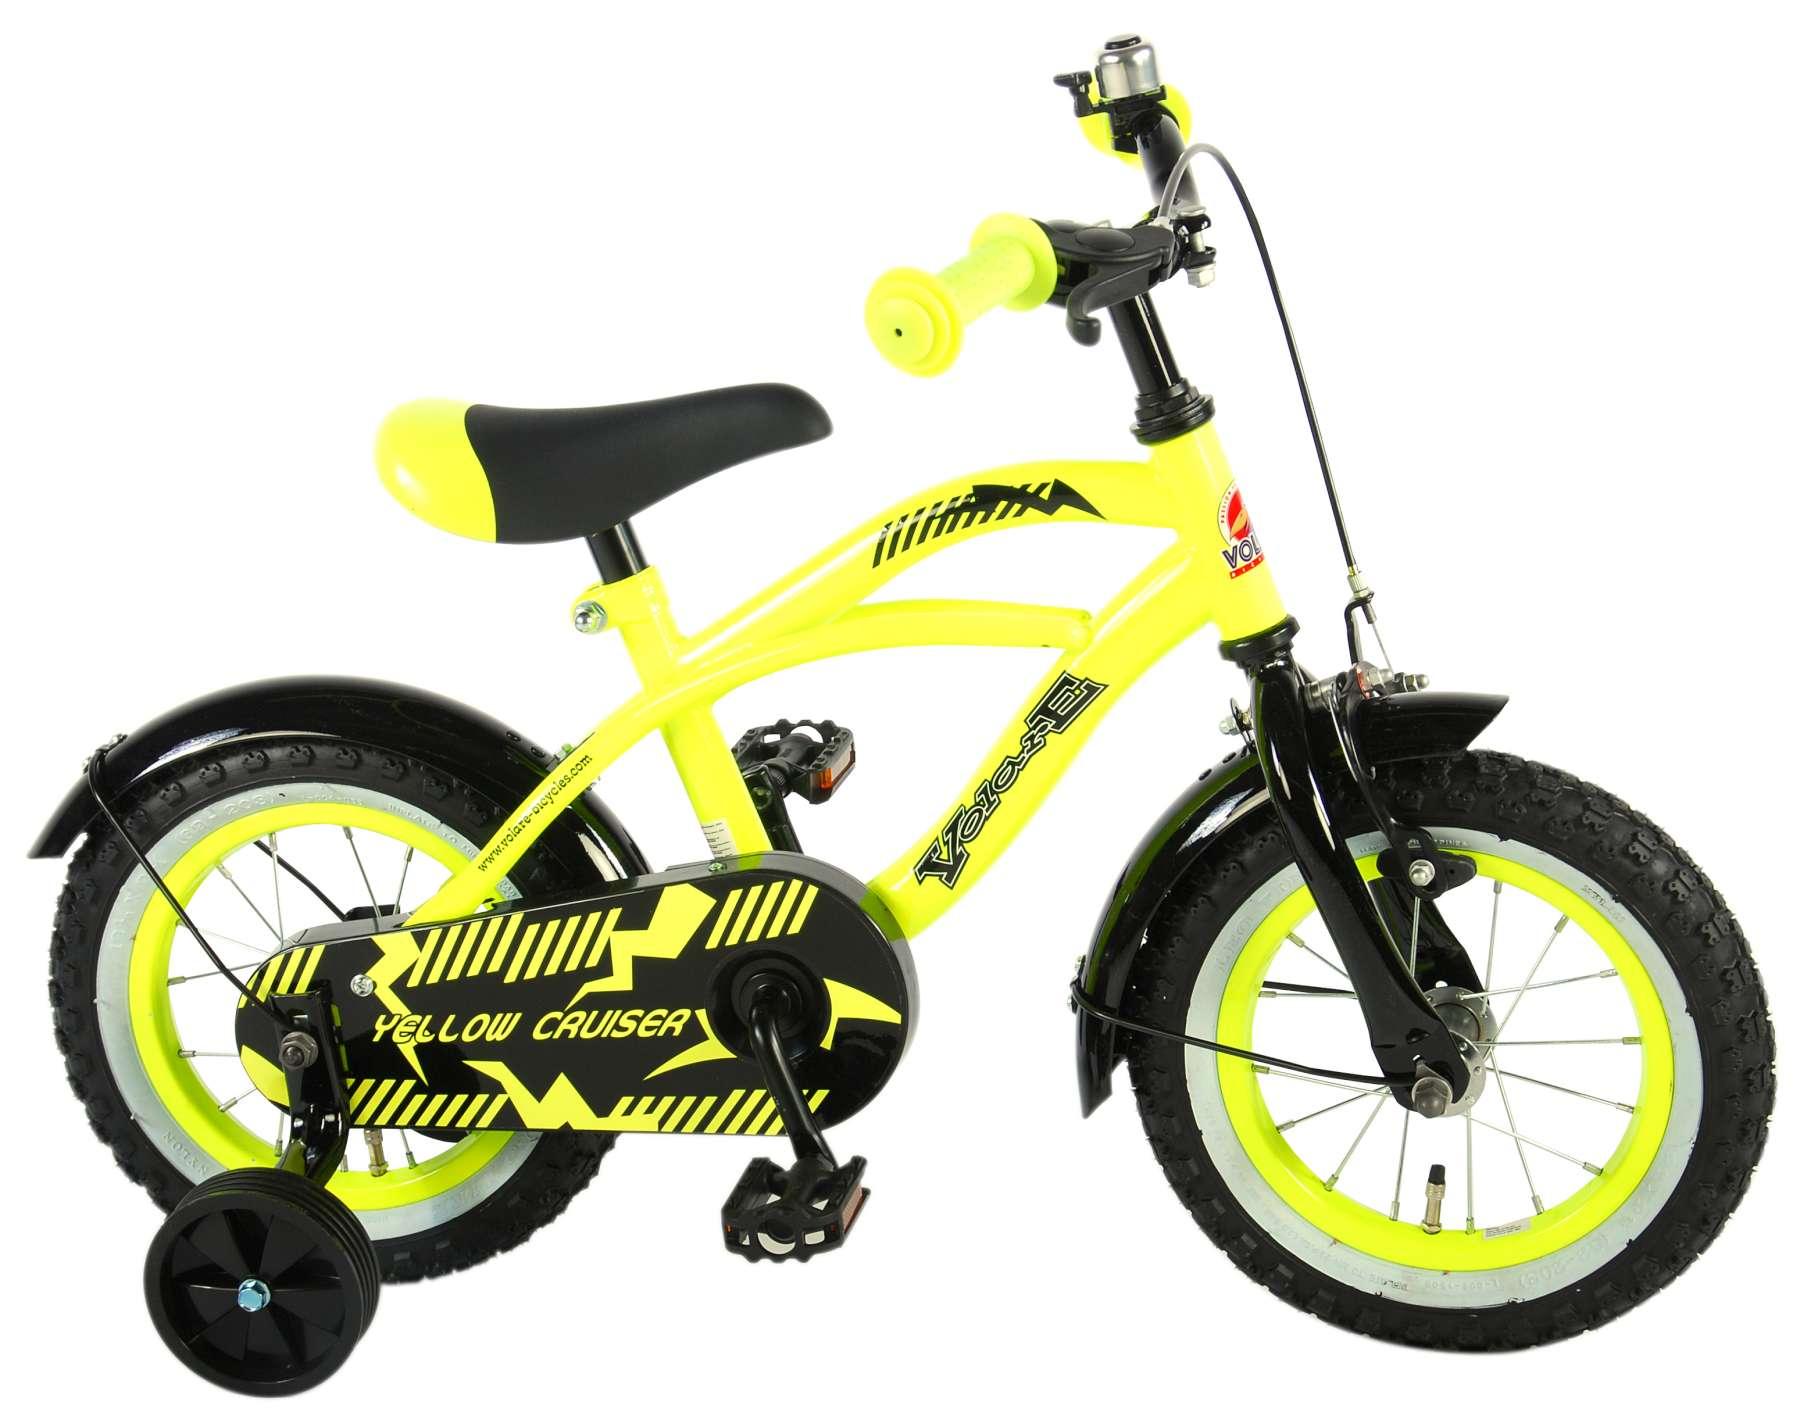 Volare - Detský bicykel pre chlapcov , Yellow Cruiser, 12